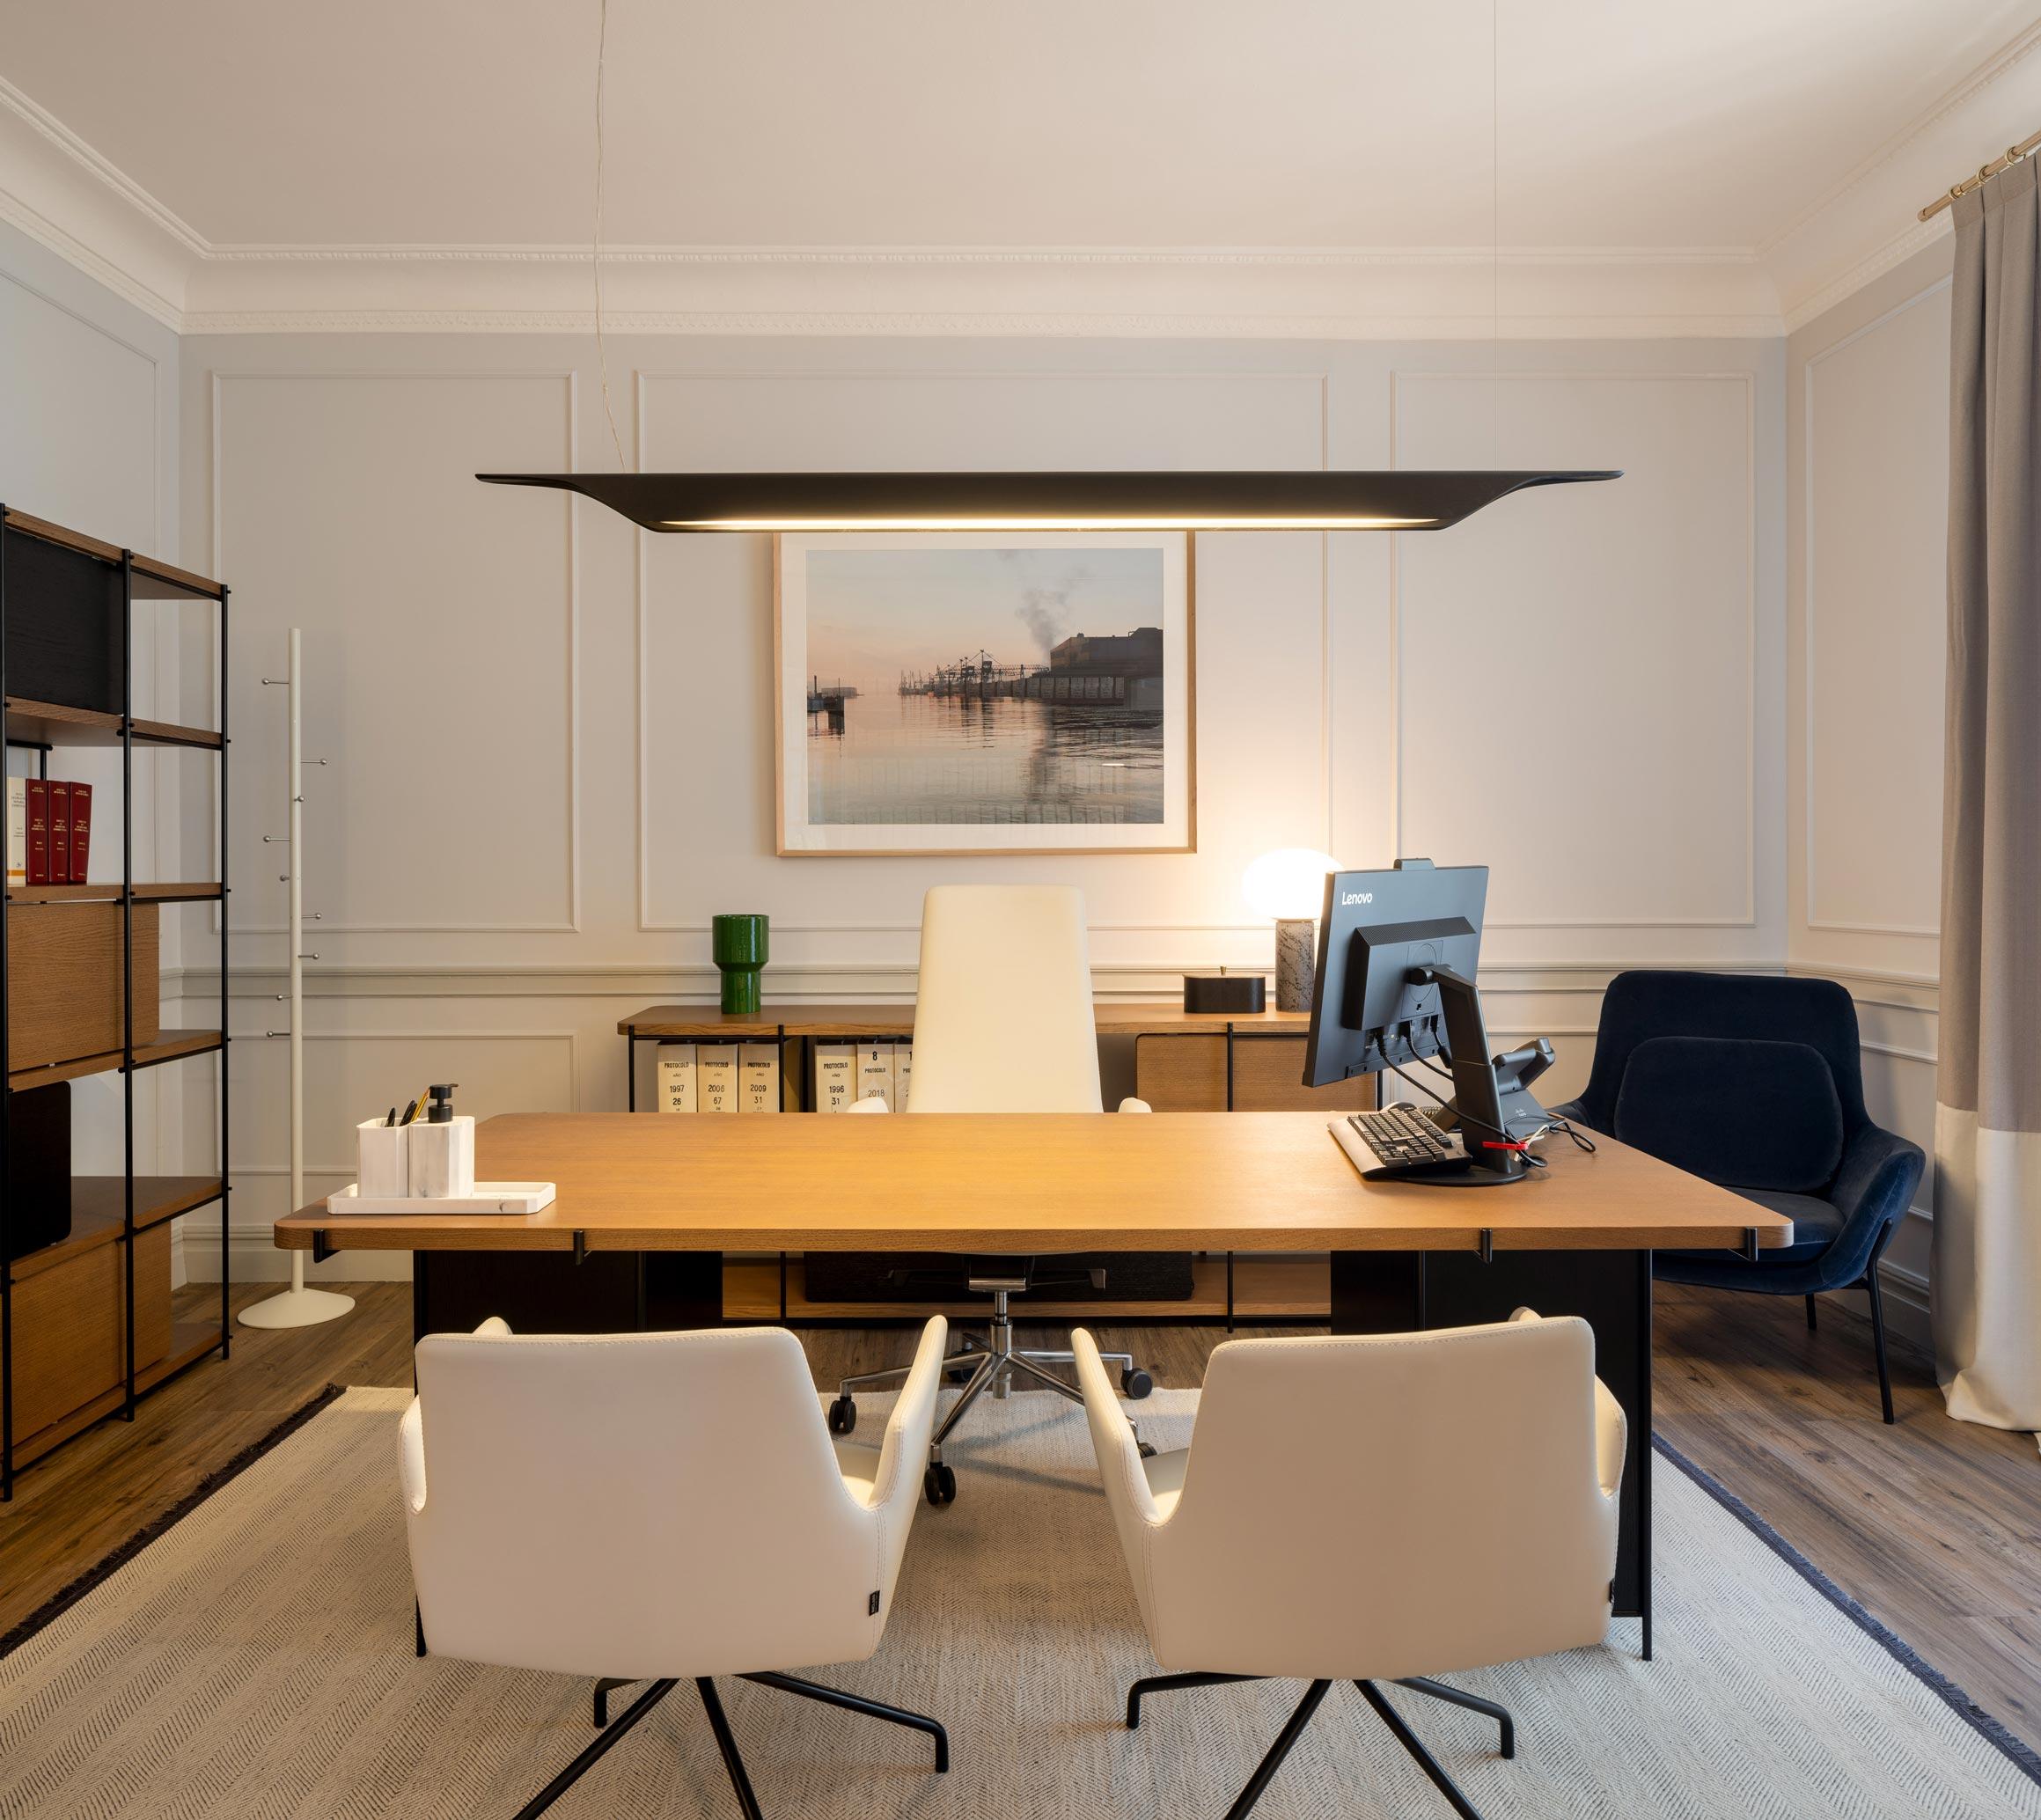 mobiliario diseño Momocca interiorismo